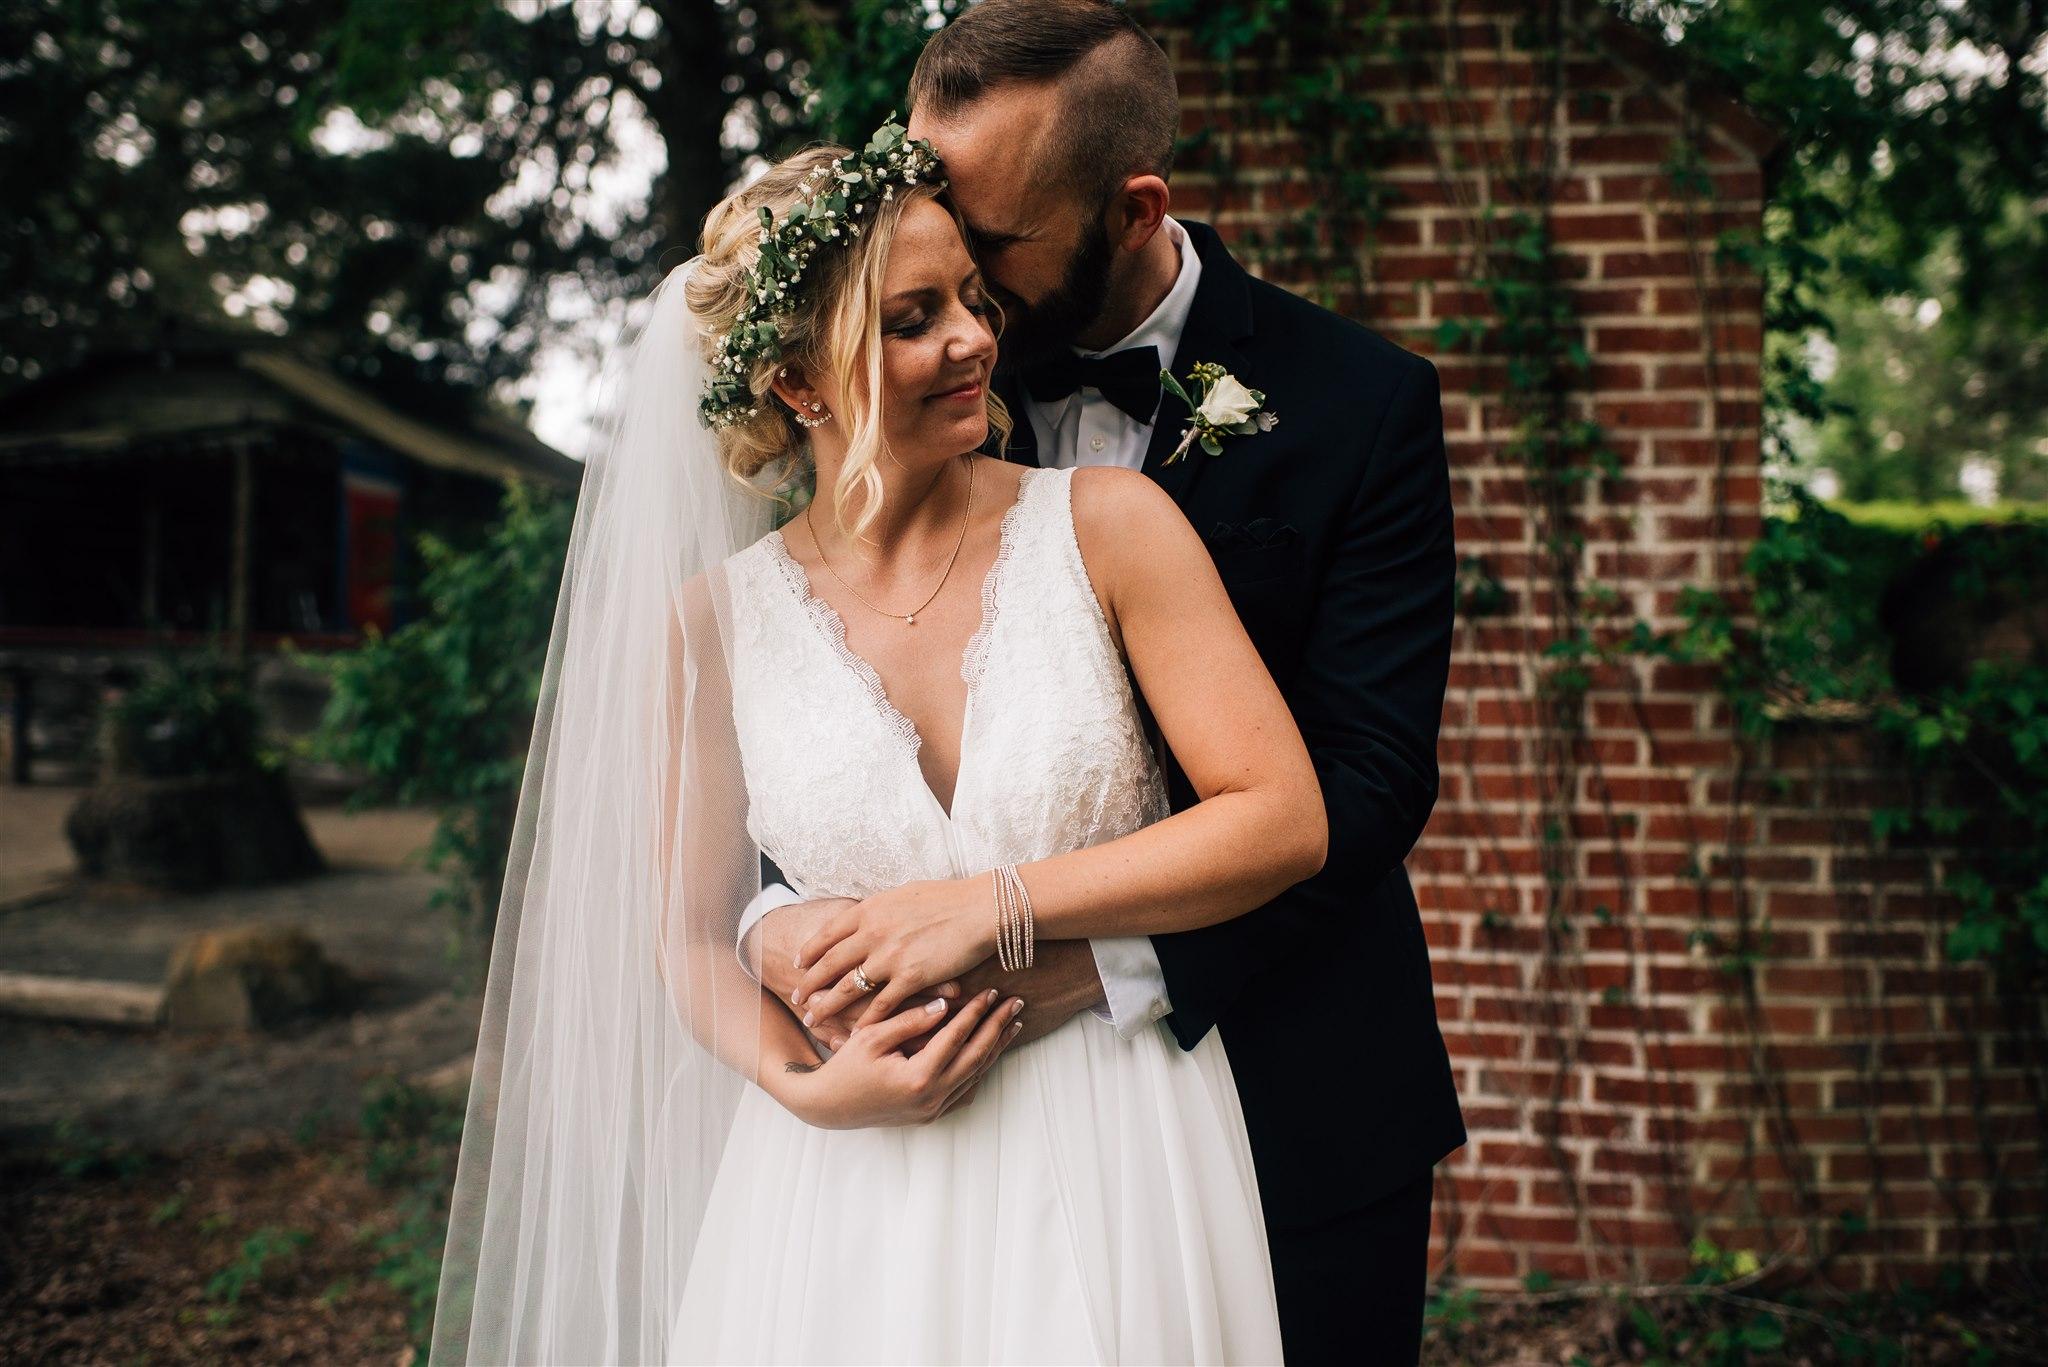 Shannon _ Tim -7253.jpgCedar Grove Acres Wedding - Raleigh Wedding Photographer - North Carolina Wedding Photographer - Creedmoor Wedding Photographer - Summer Wedding